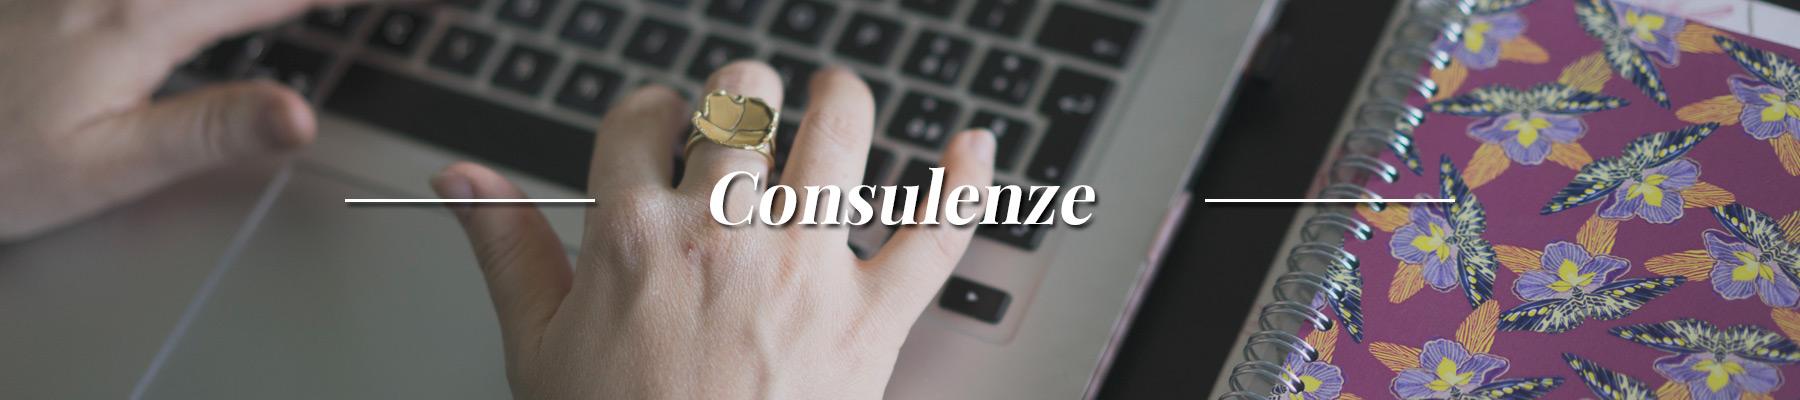 header-consulenze